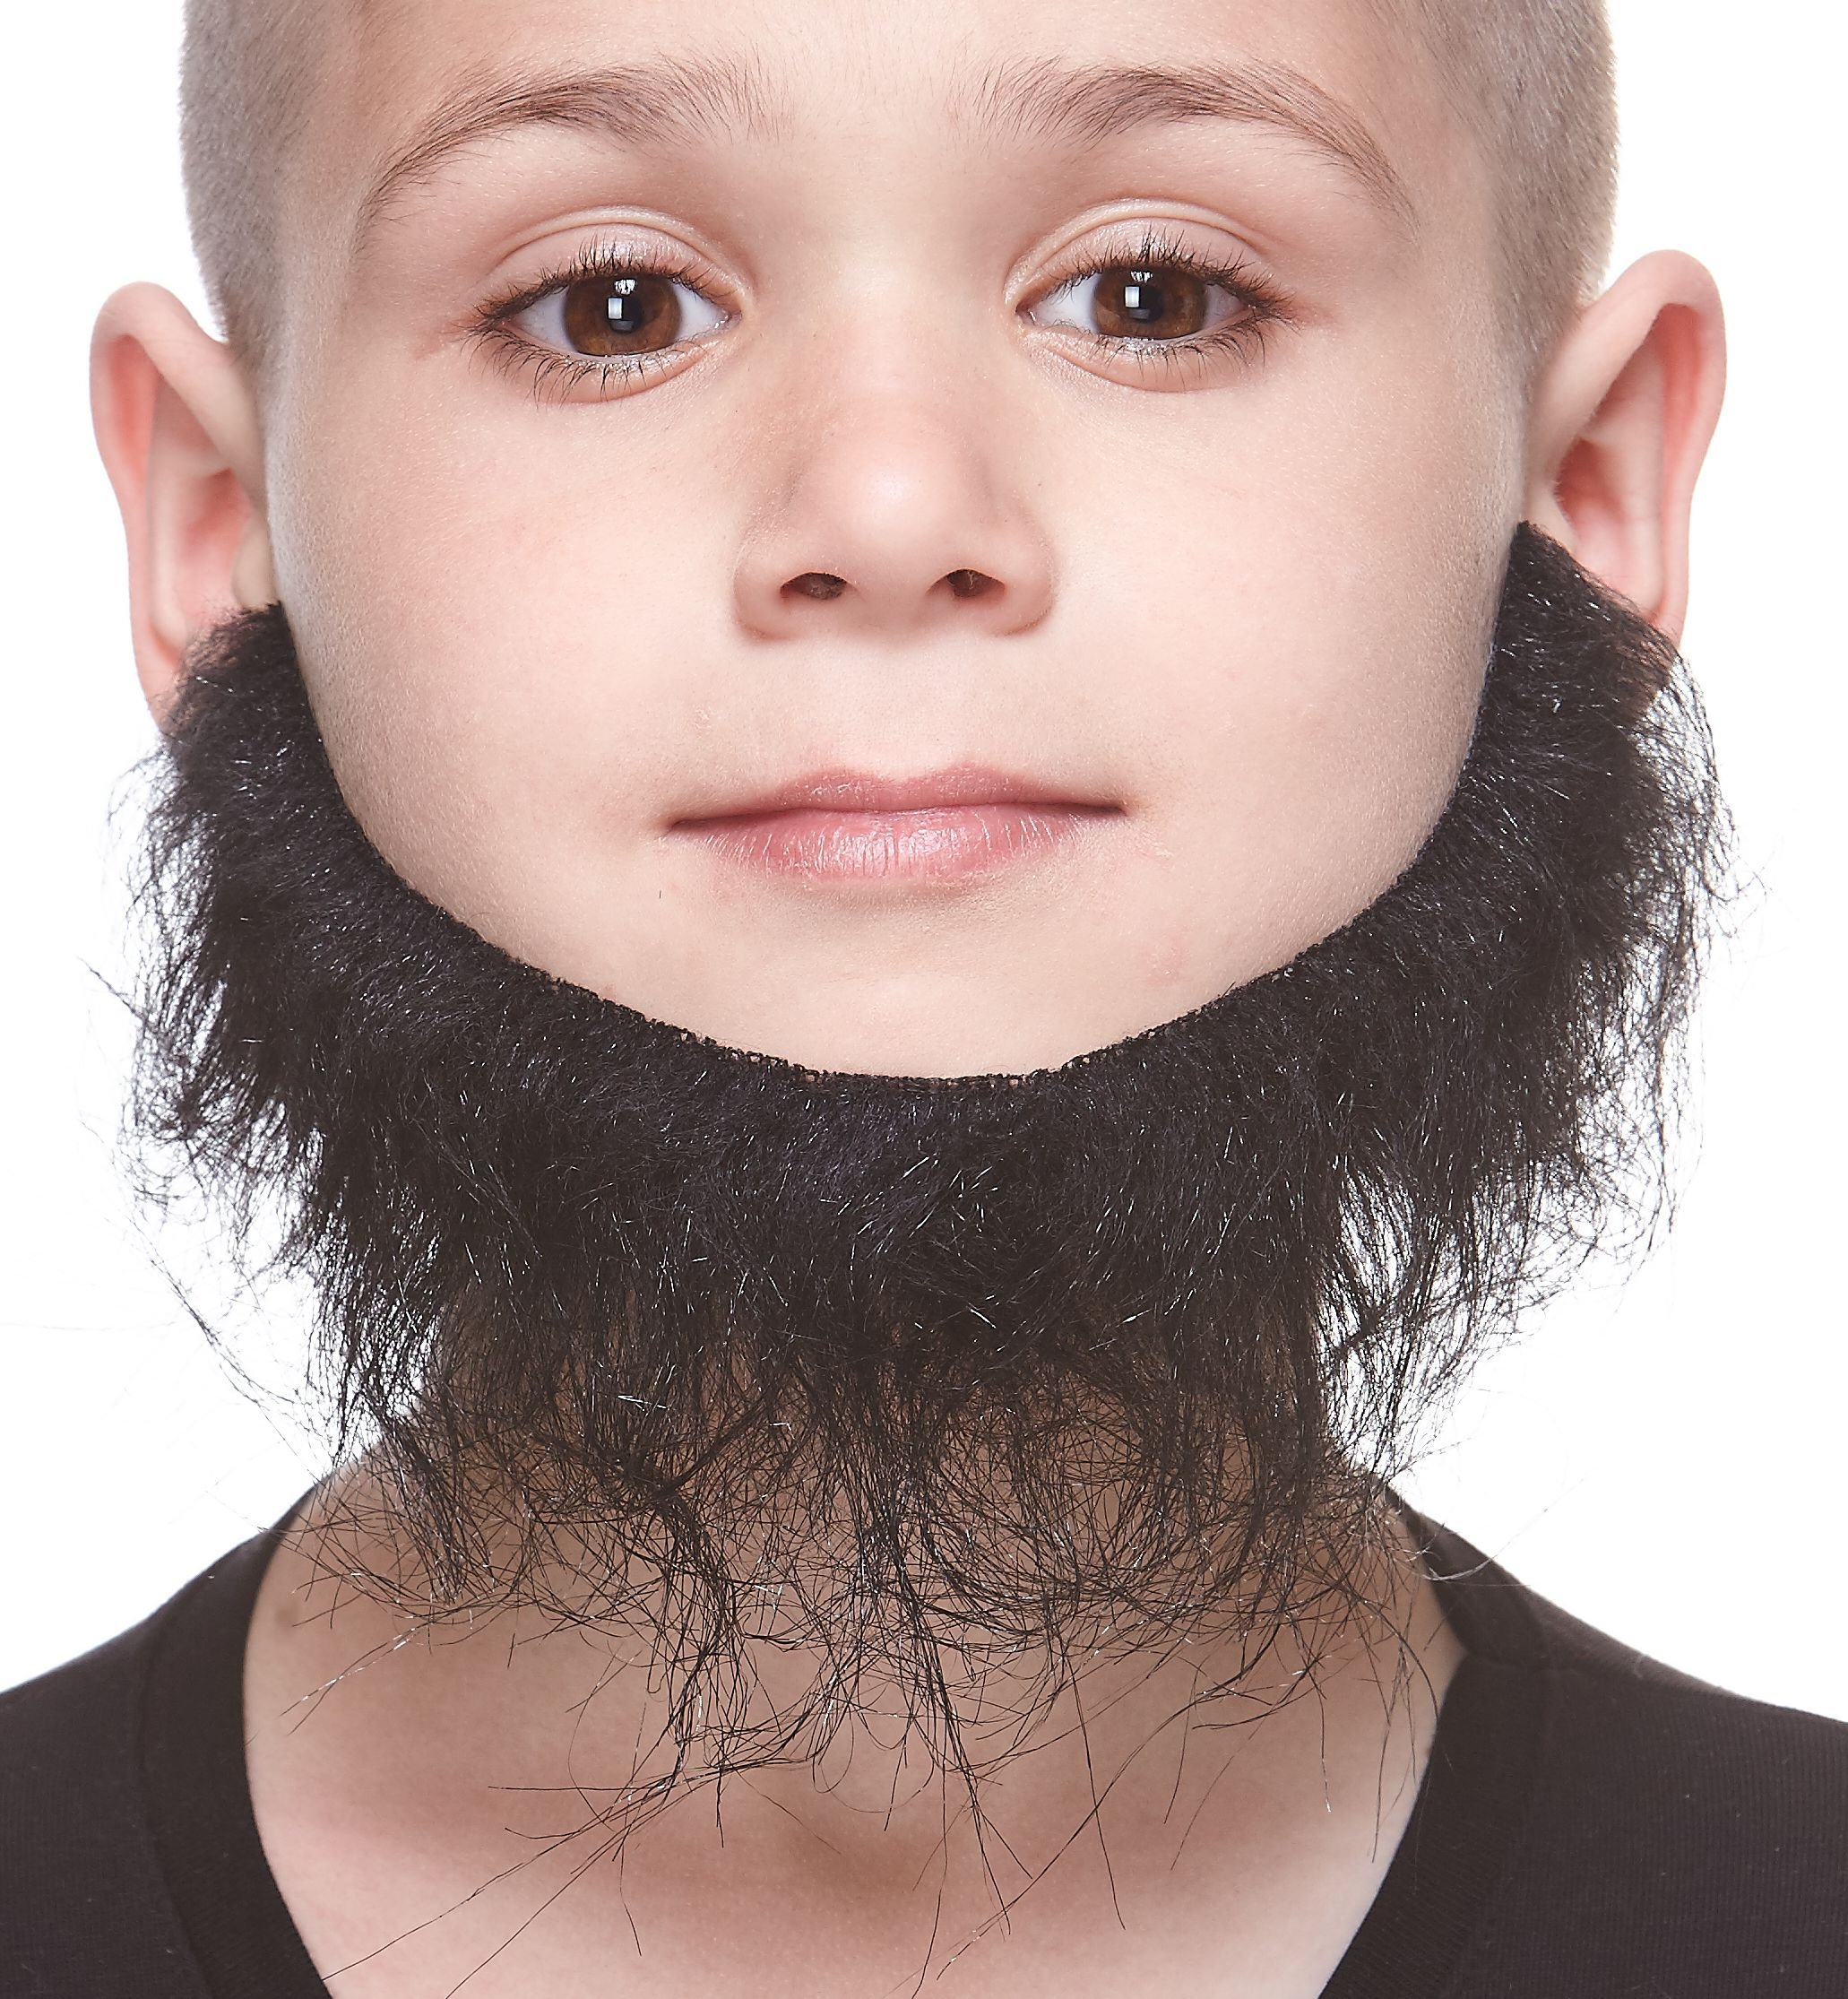 Mustaches Fake Beard, Self Adhesive, Novelty, Realistic, Small Morman False Facial Hair, Costume Accessory for Kids, Black Color